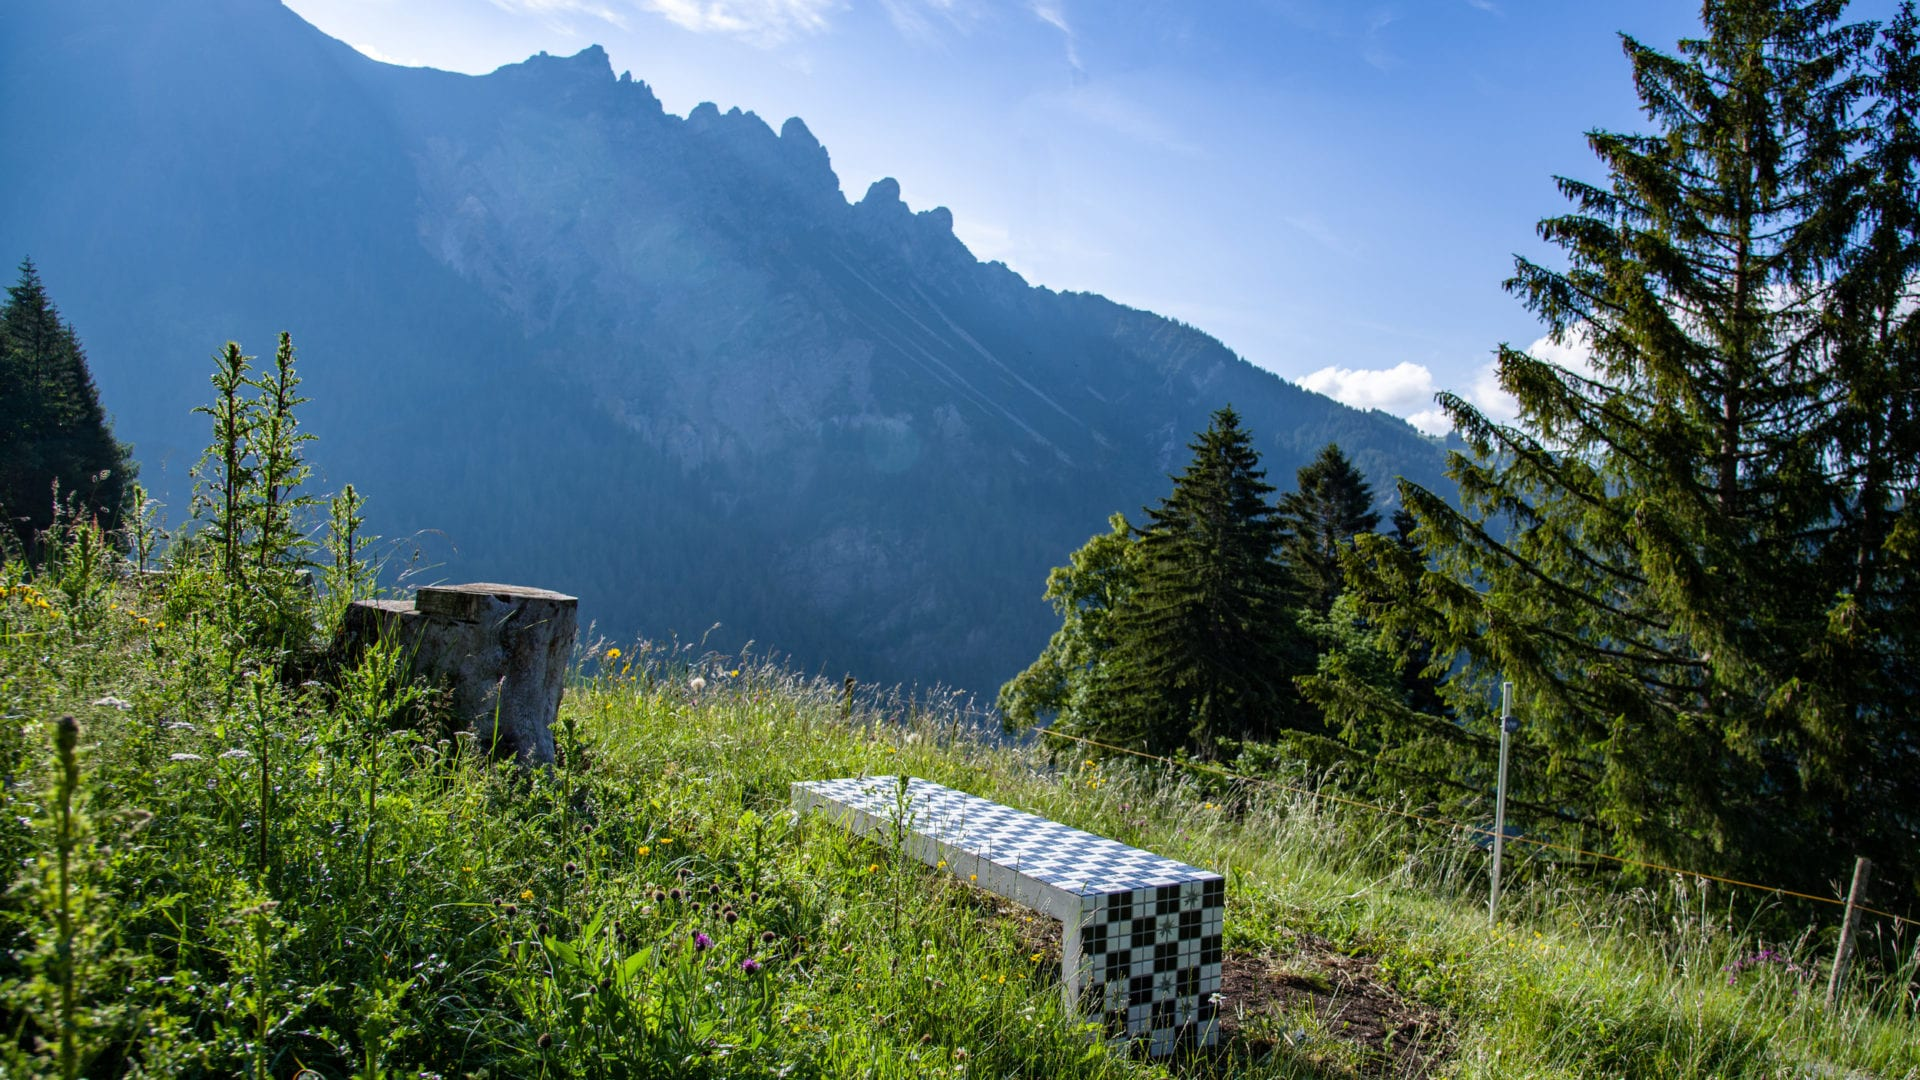 Alpine Art Muttersberg, Blickbank - Monika Grabuschnigg, (c) Oliver Lerch